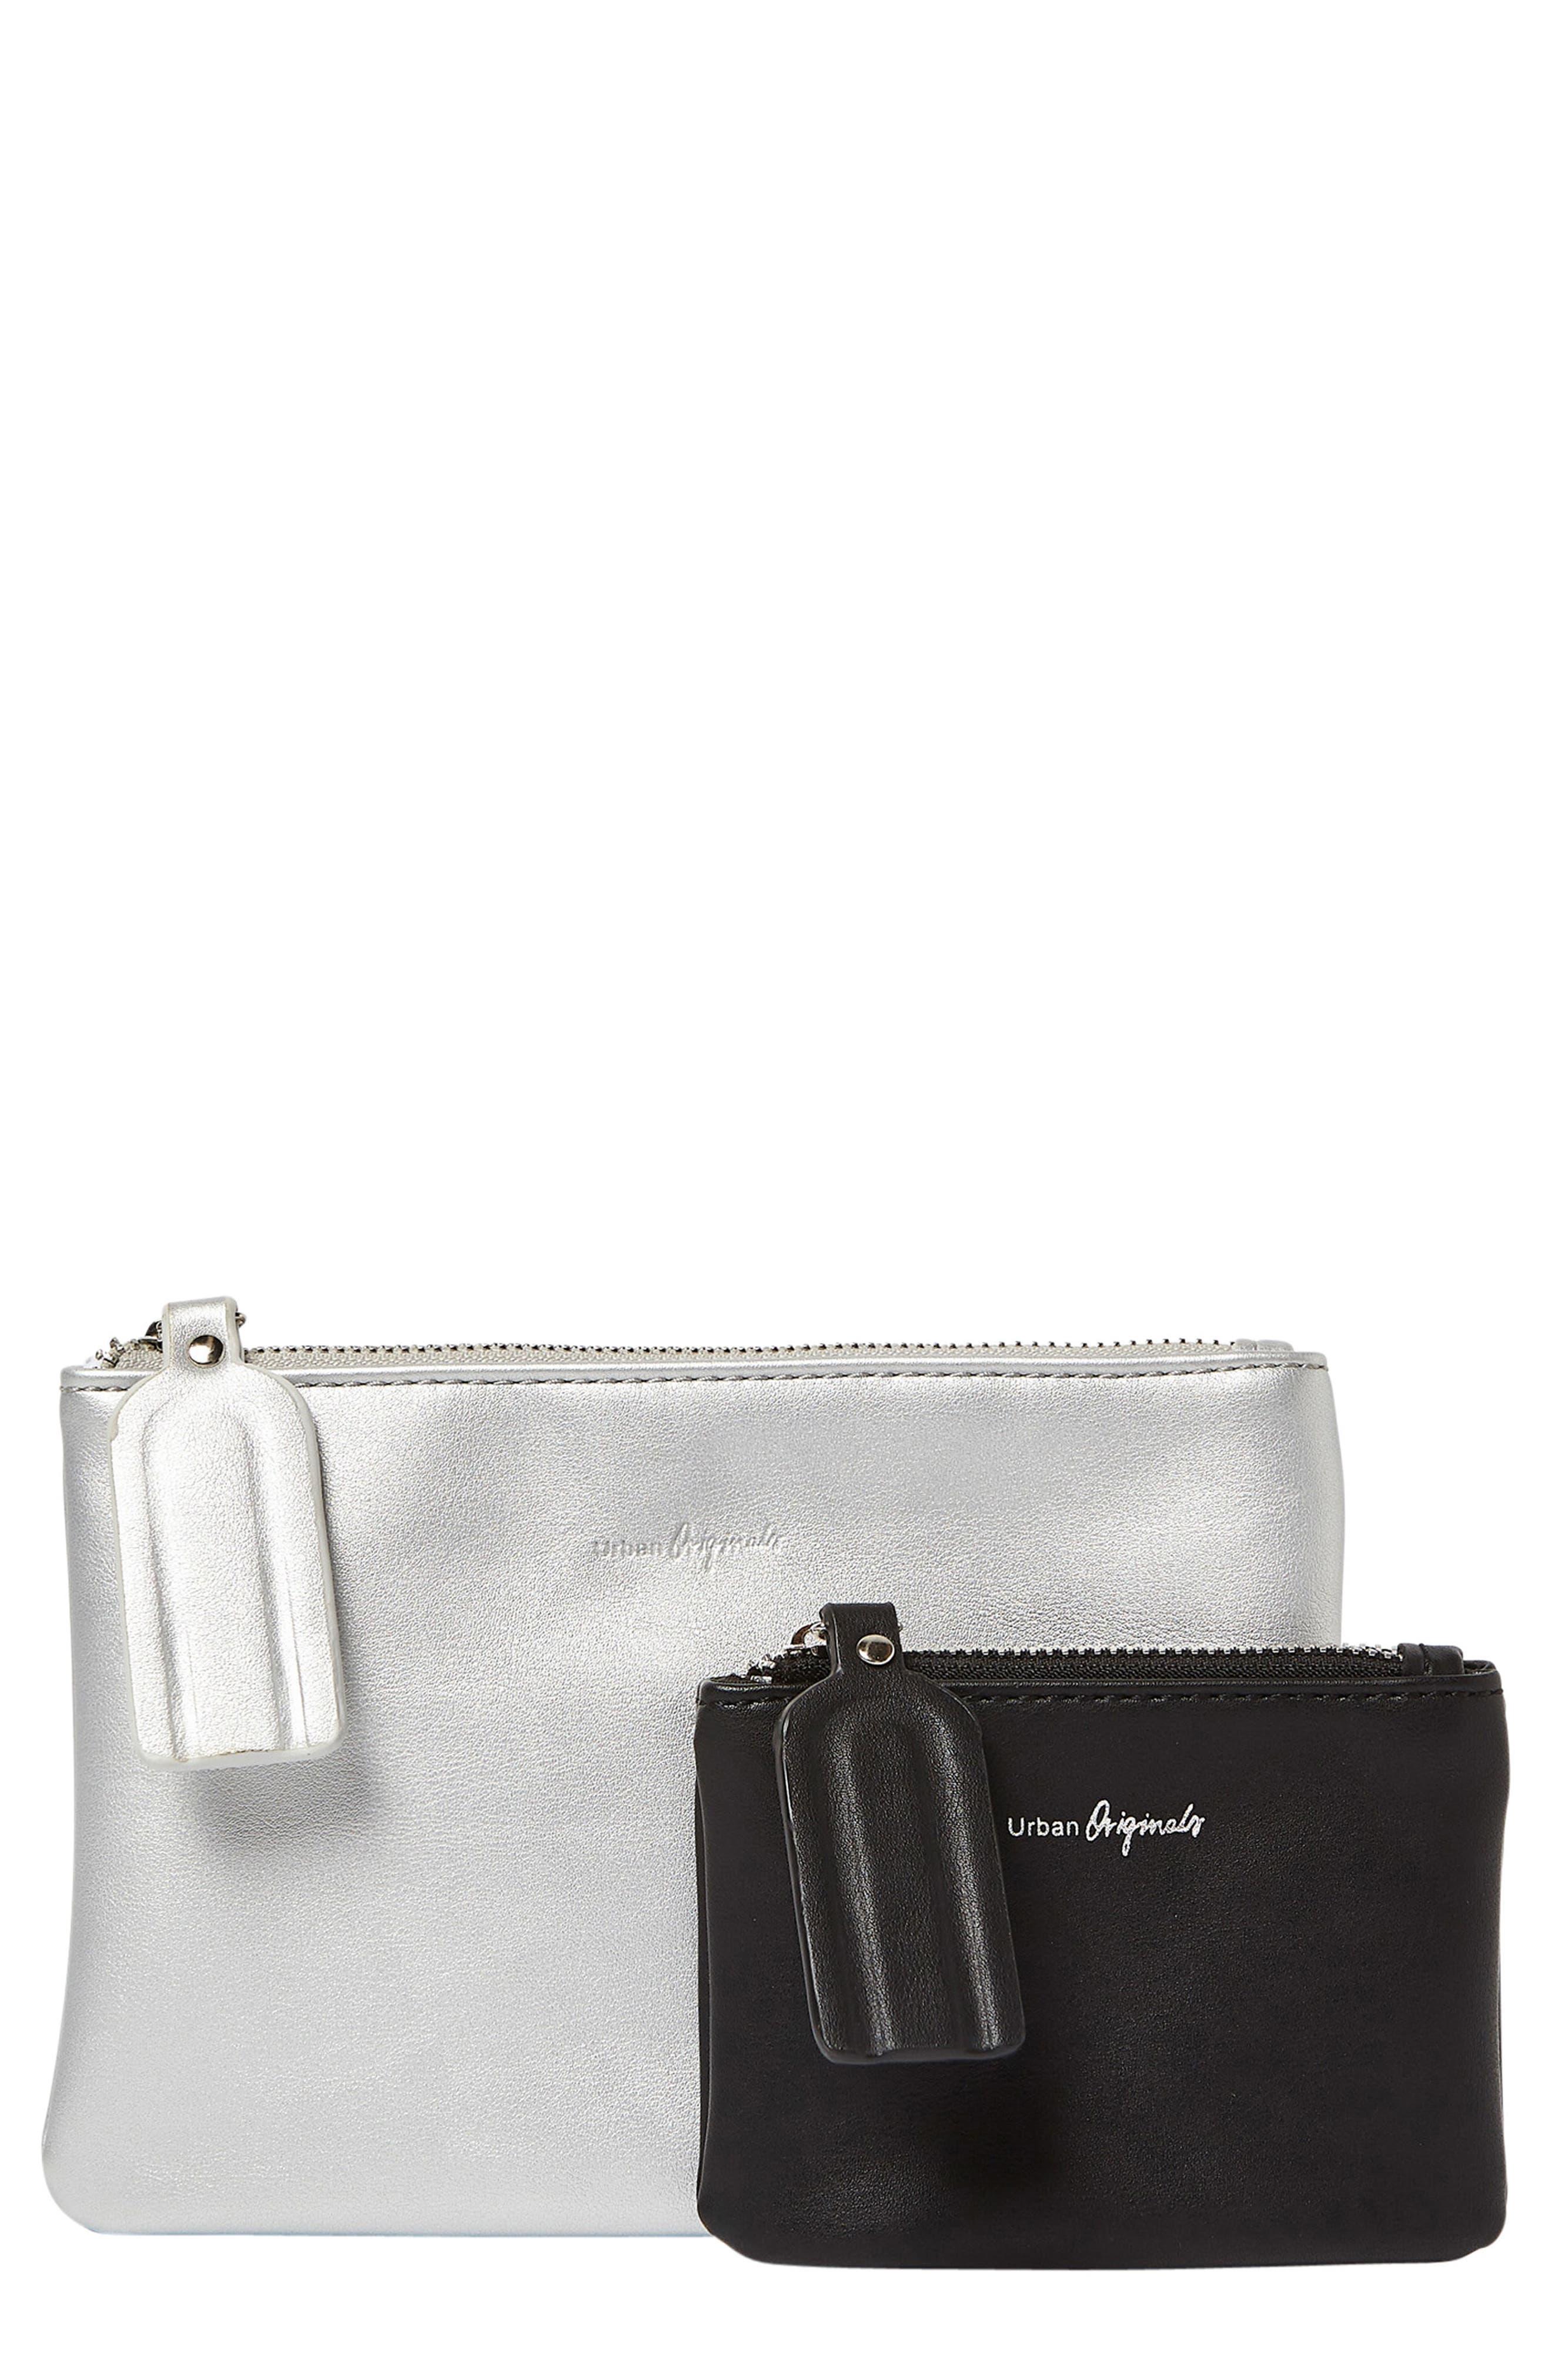 Dreamer 2-Pack Vegan Leather Card Cases,                             Main thumbnail 1, color,                             Black/ Silver